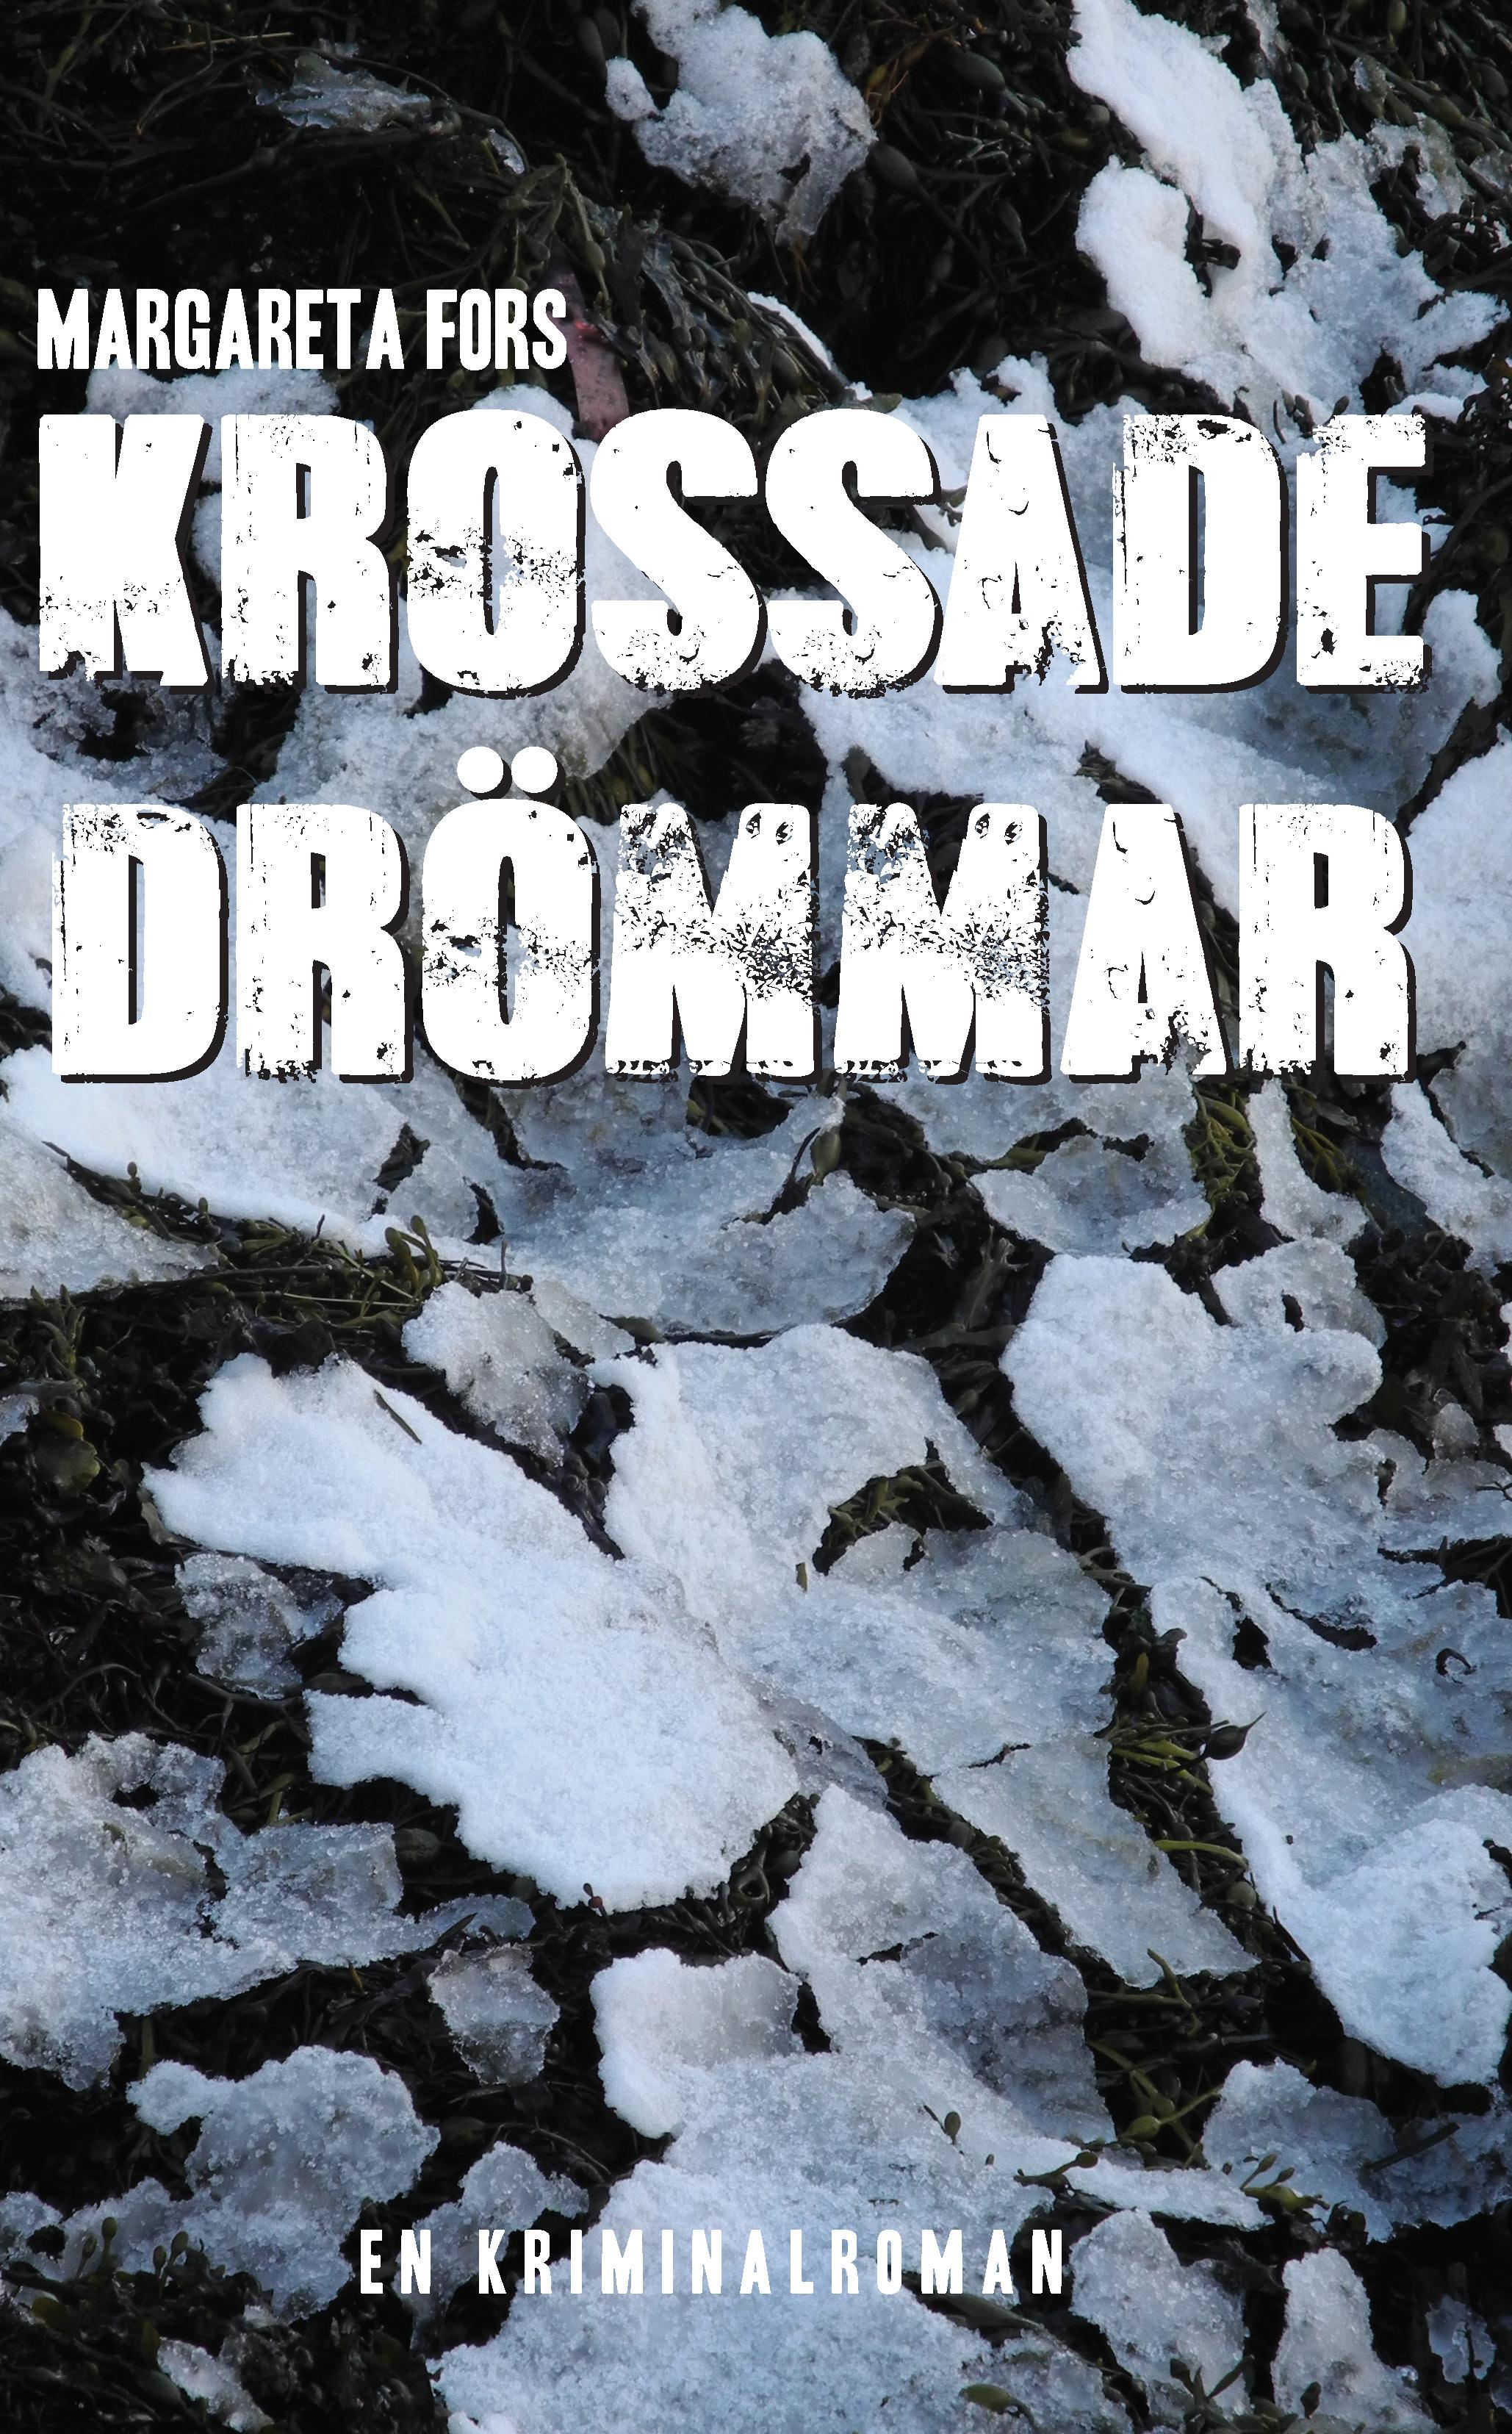 Kriminalromanen Krossade drömmar av Margareta Fors